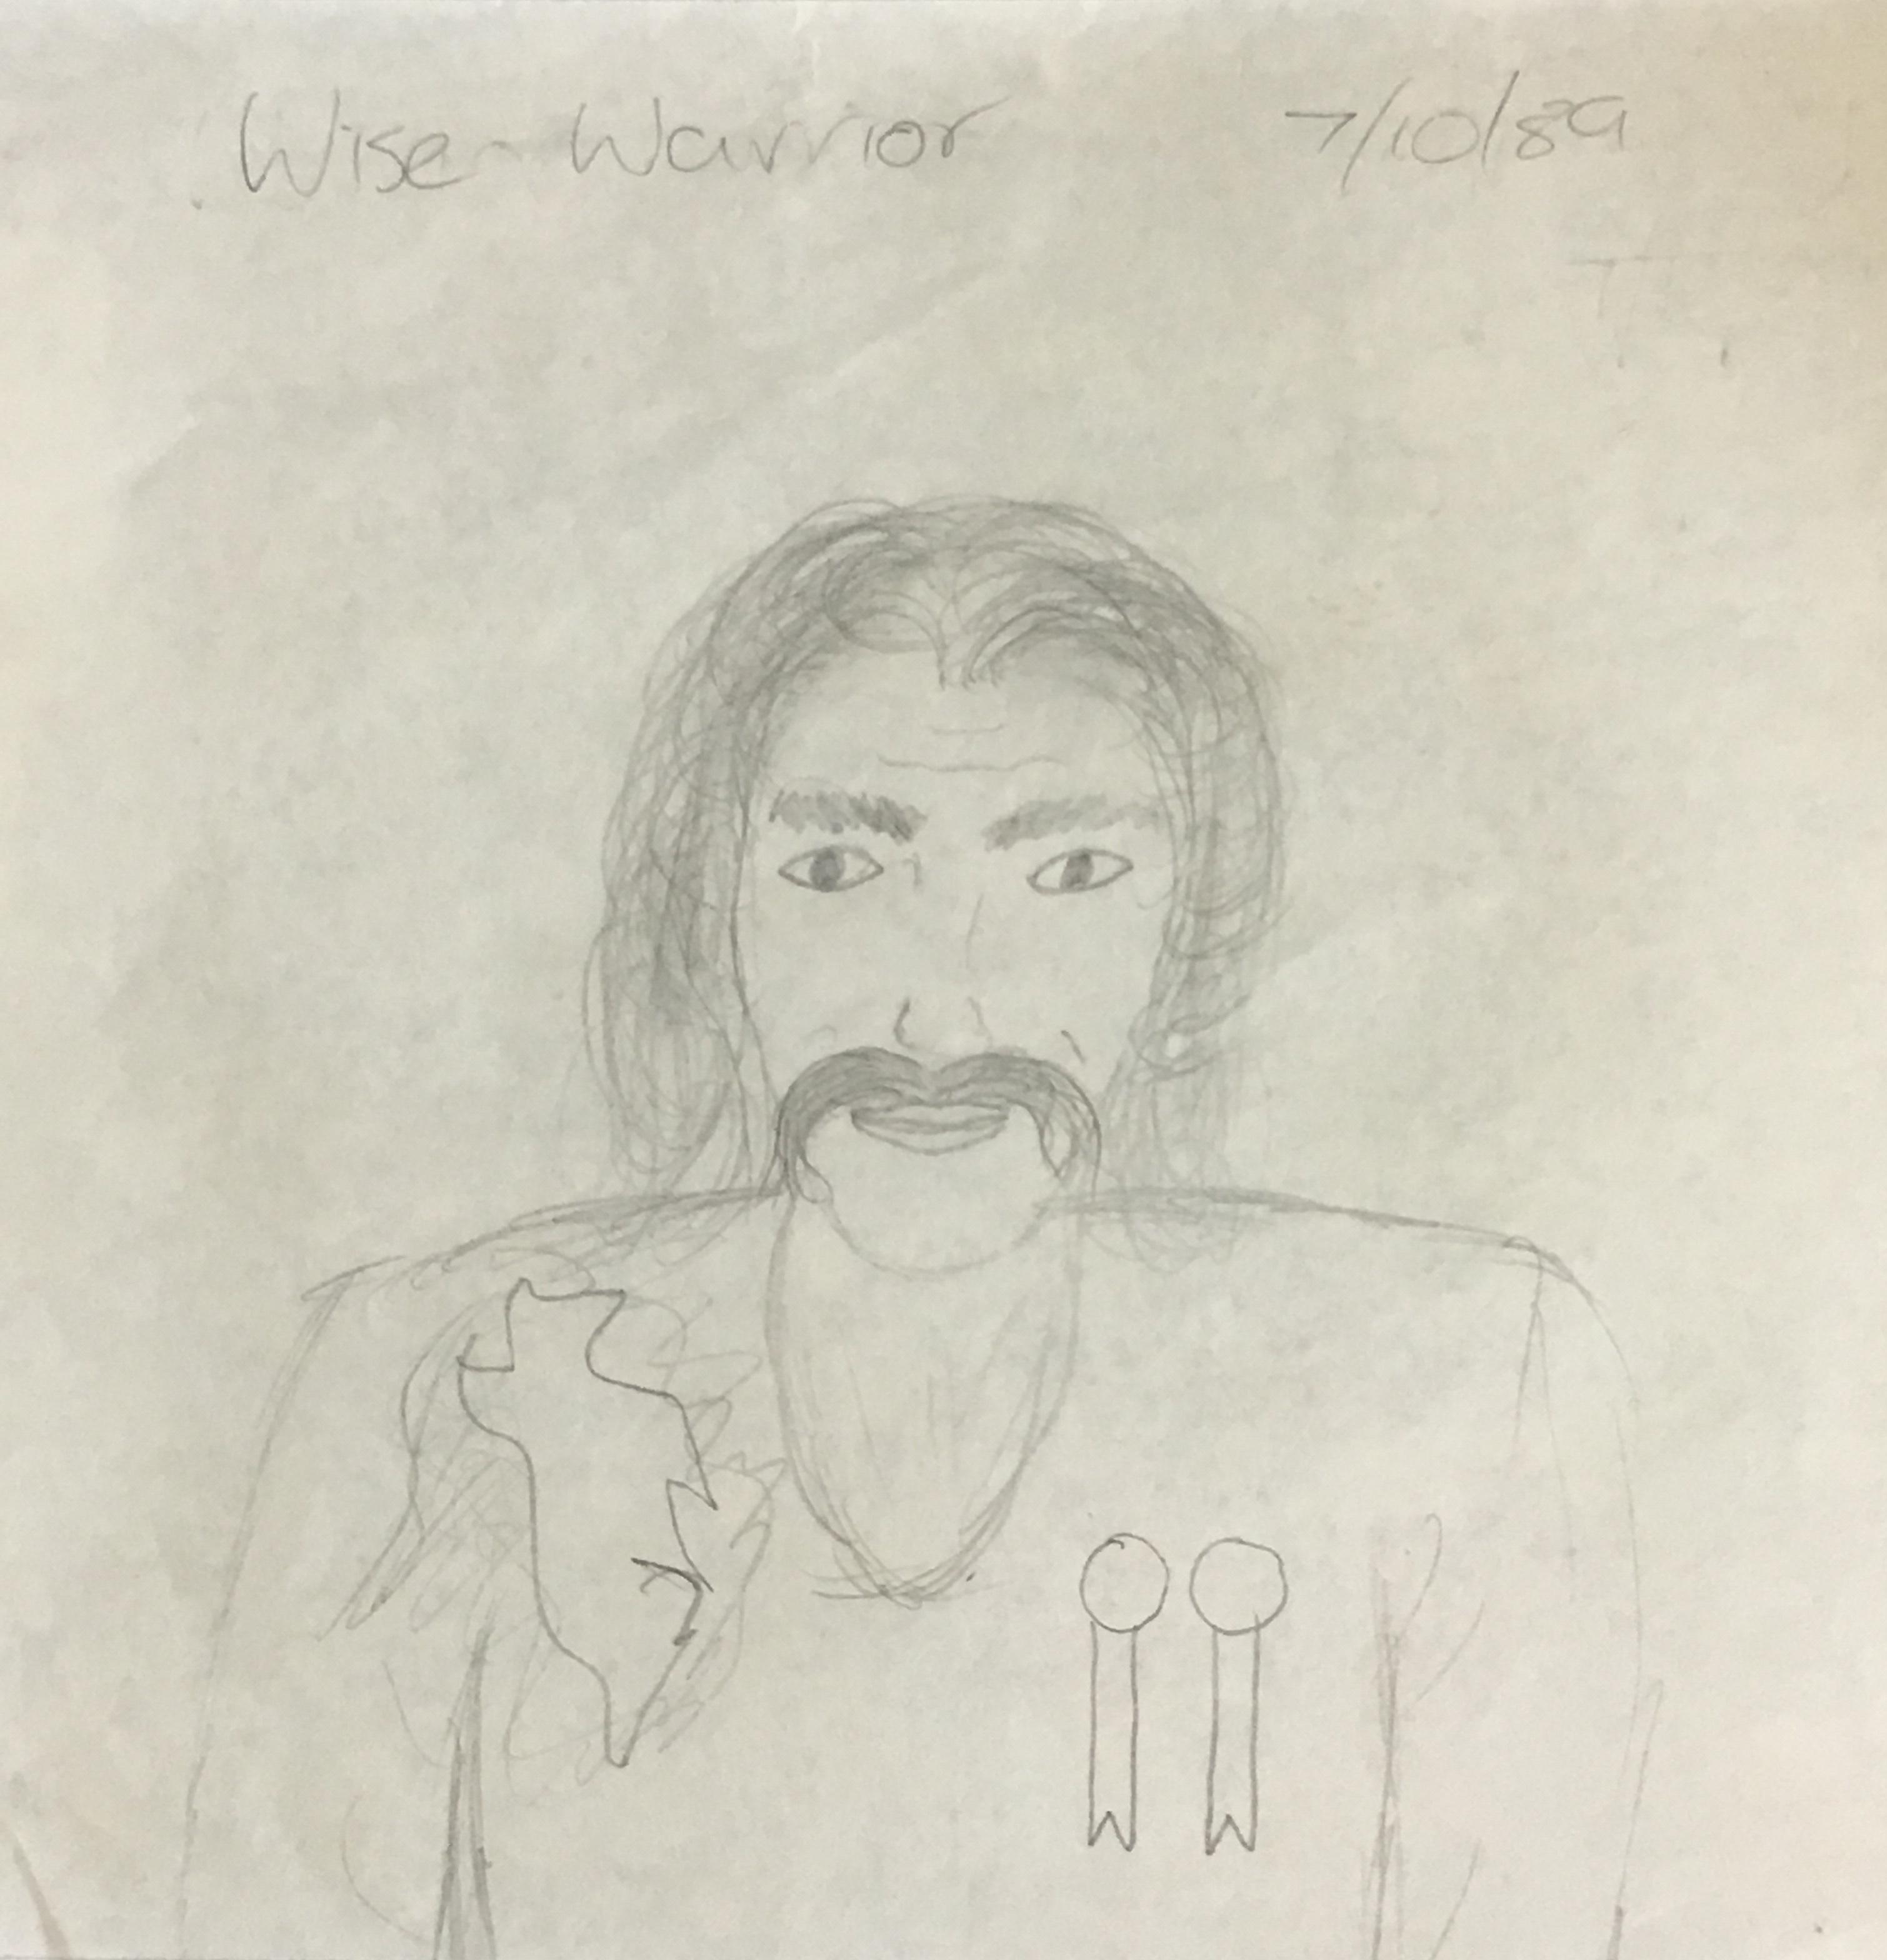 Old sketch wise warrior